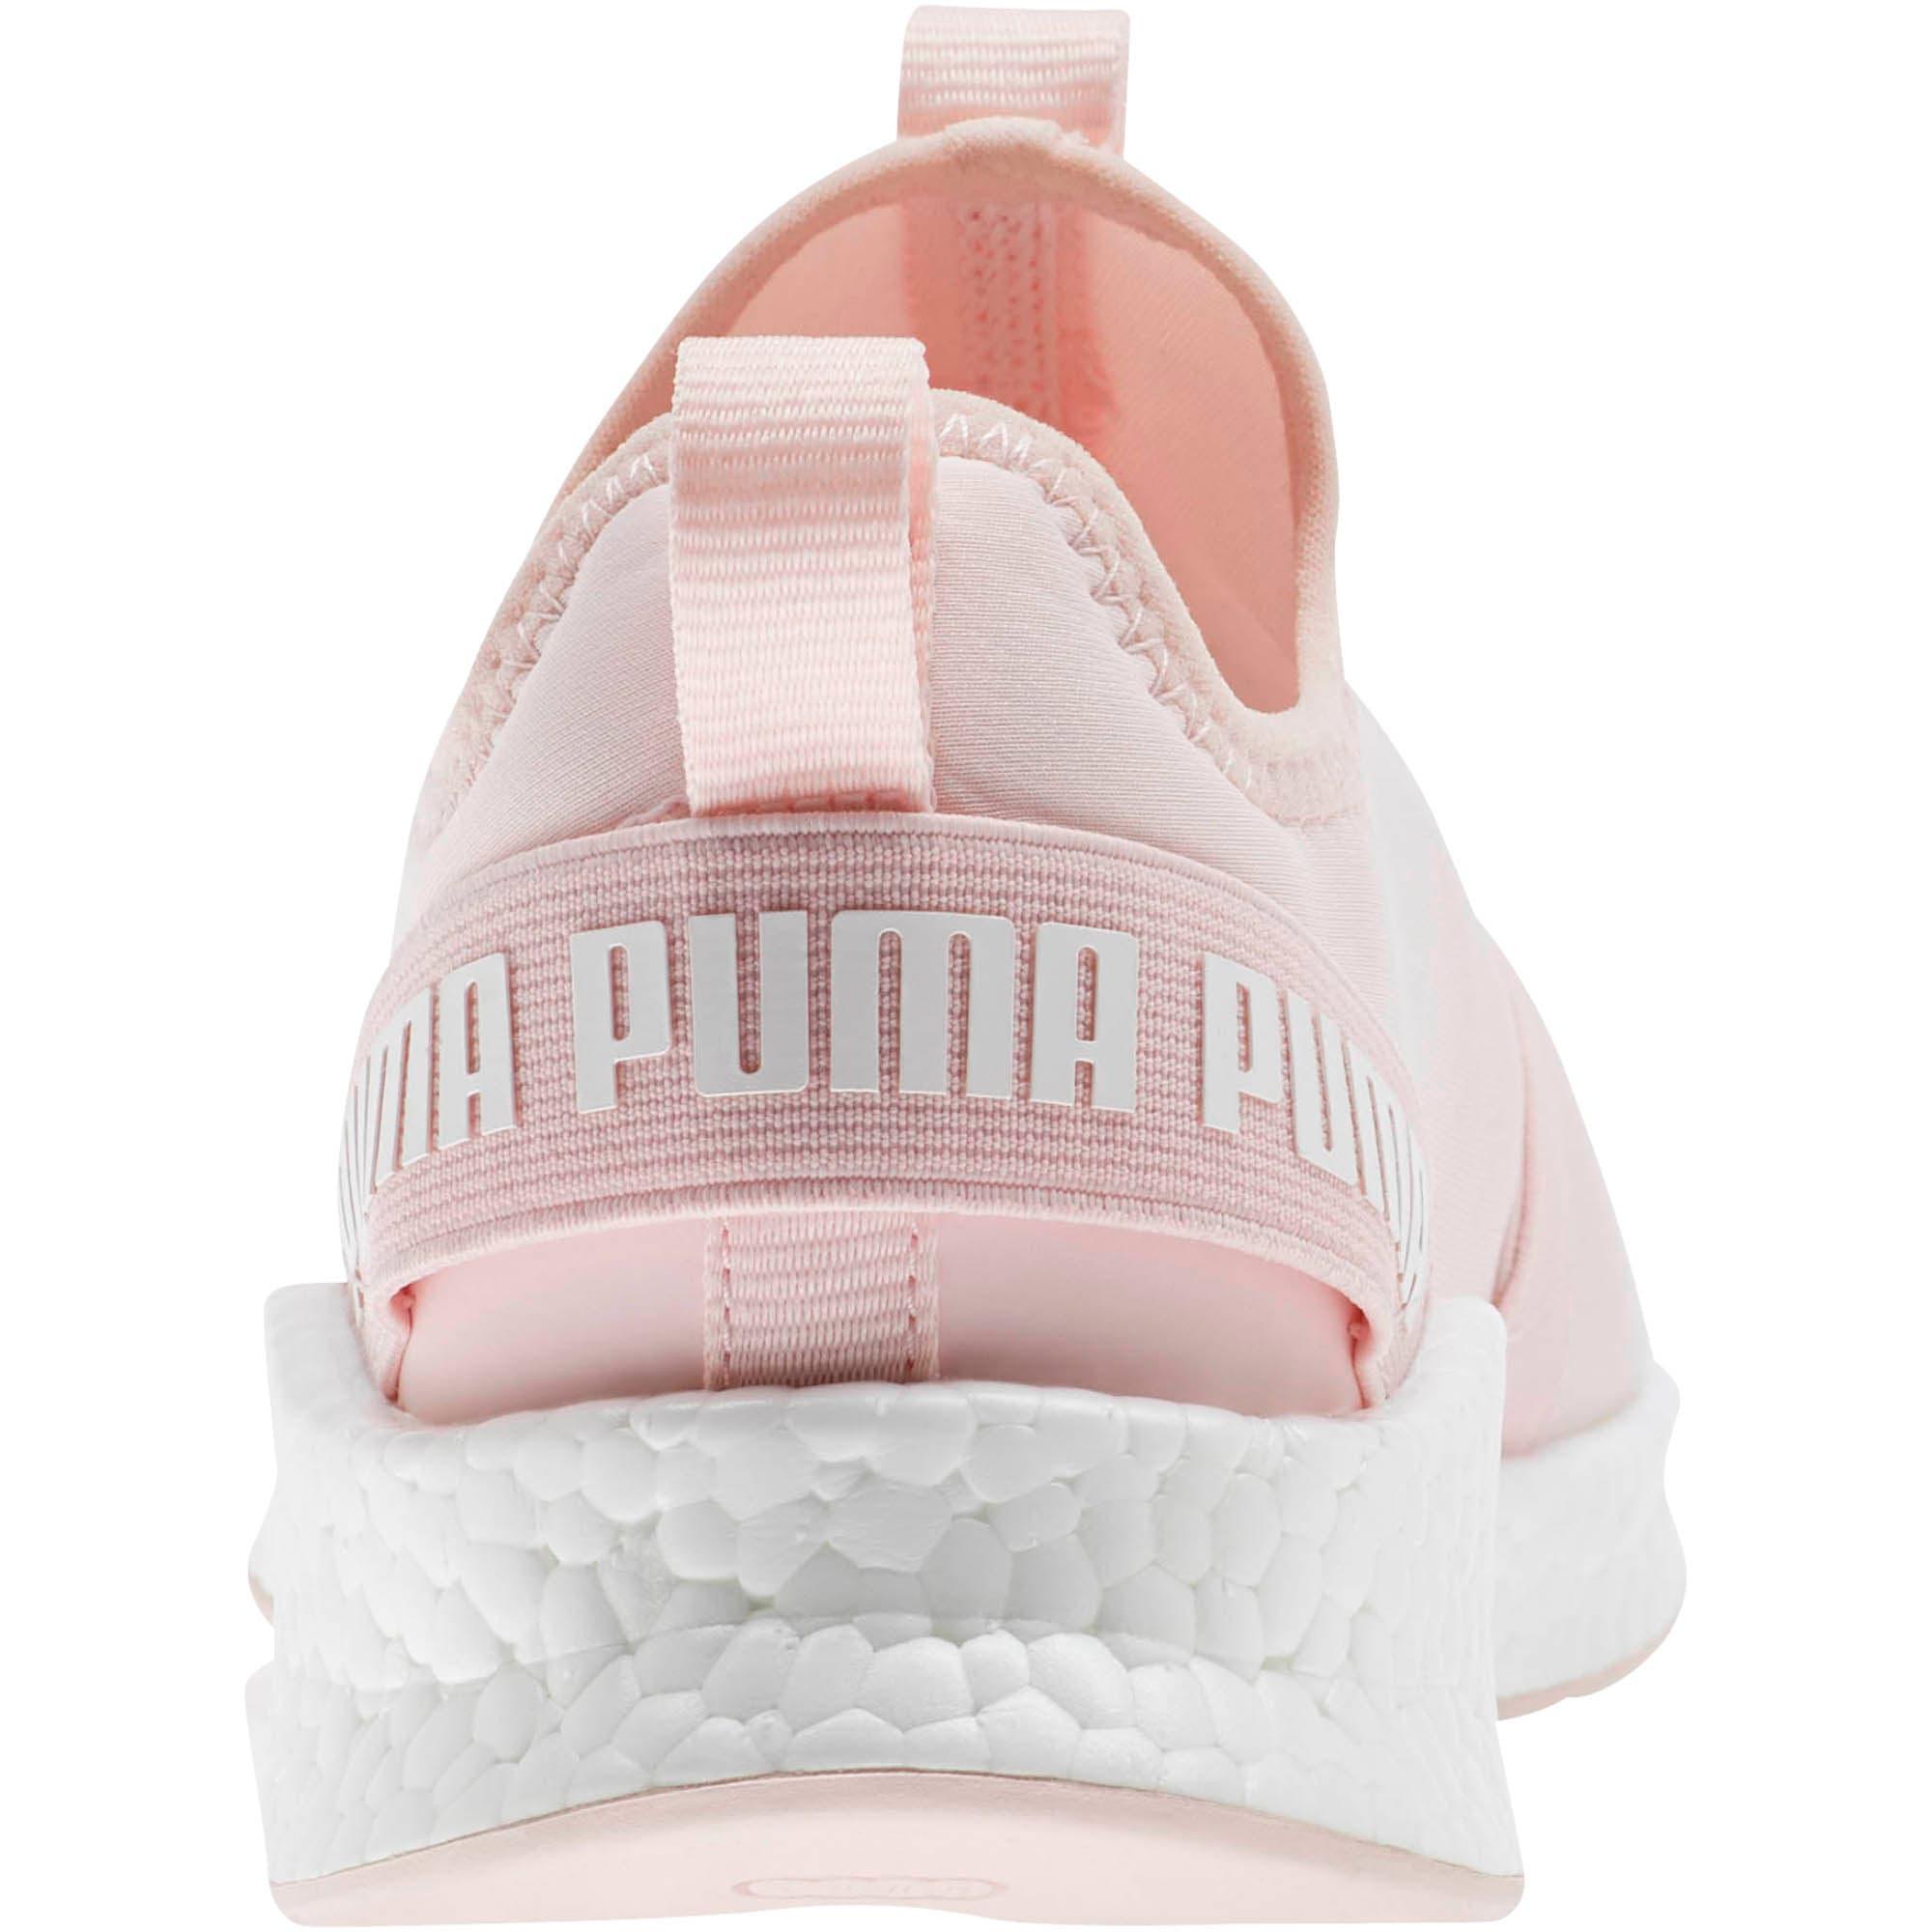 Thumbnail 3 of NRGY Star Slip-On Women's Running Shoes, Pearl-Puma White, medium